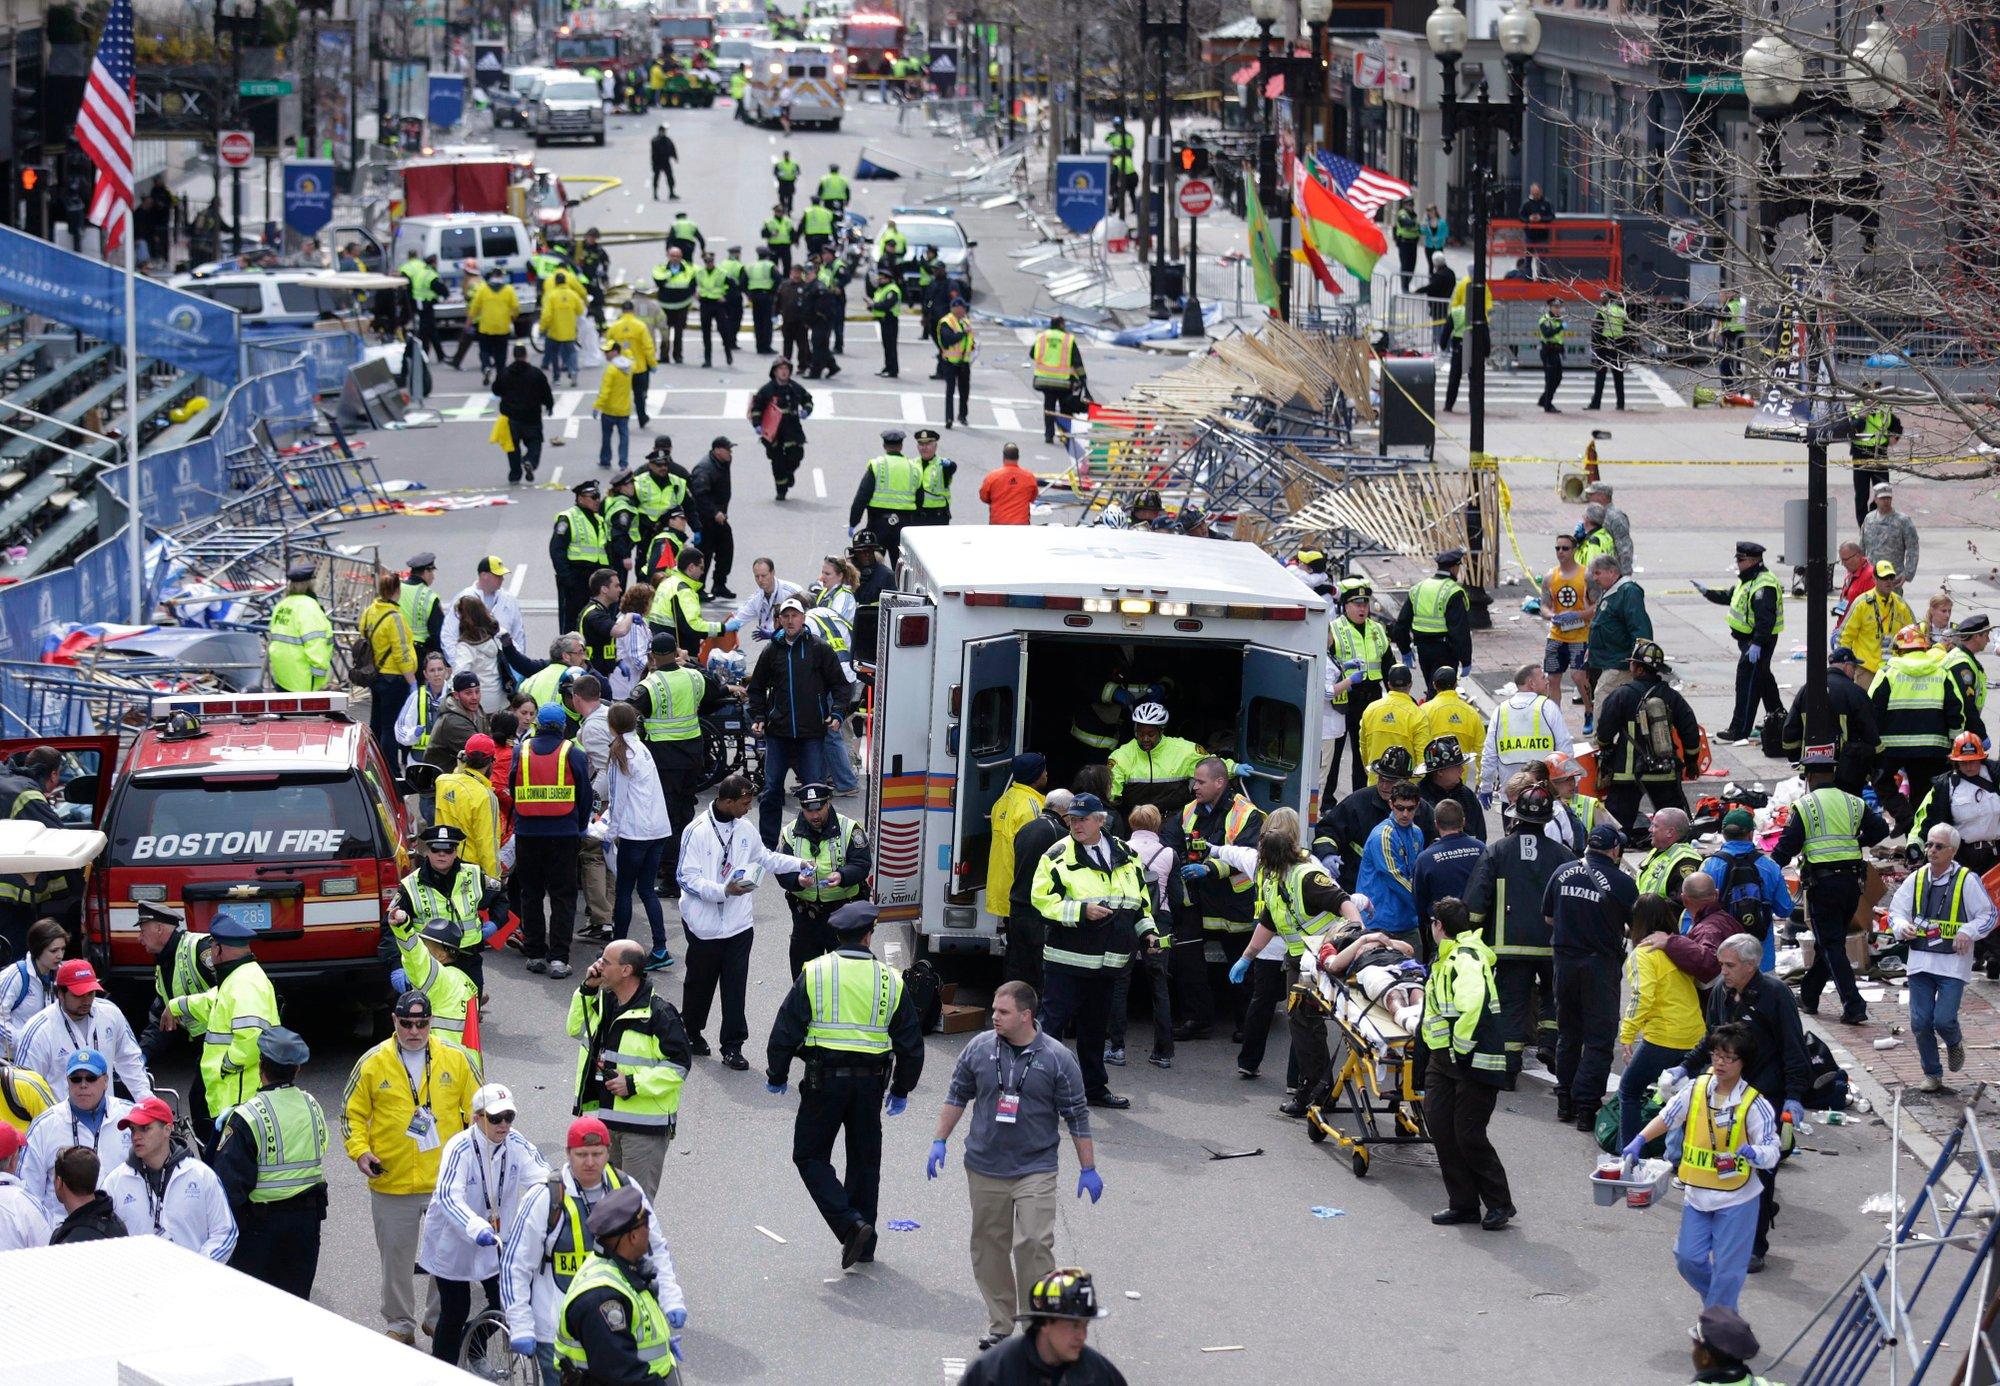 9725258a90bb Key moments in the 2013 Boston Marathon bombing